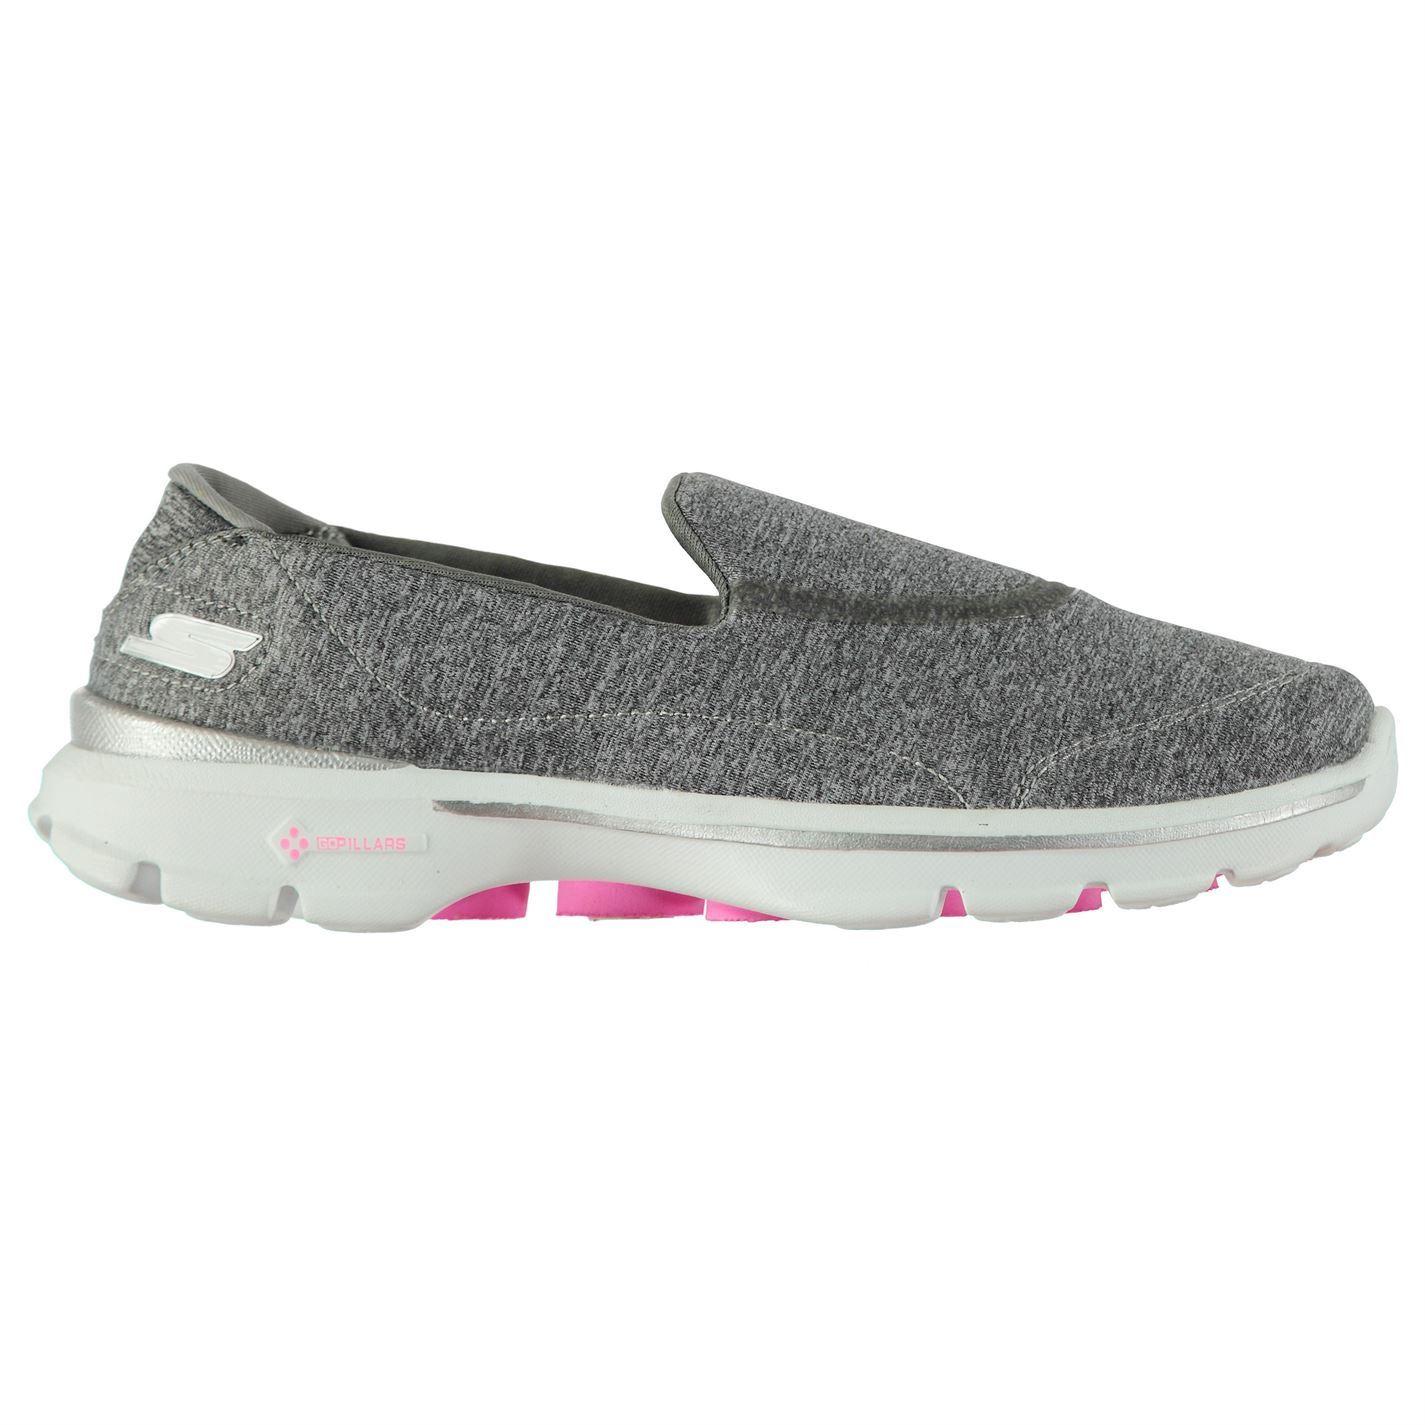 Skechers Go Walk Shoes Waterproof